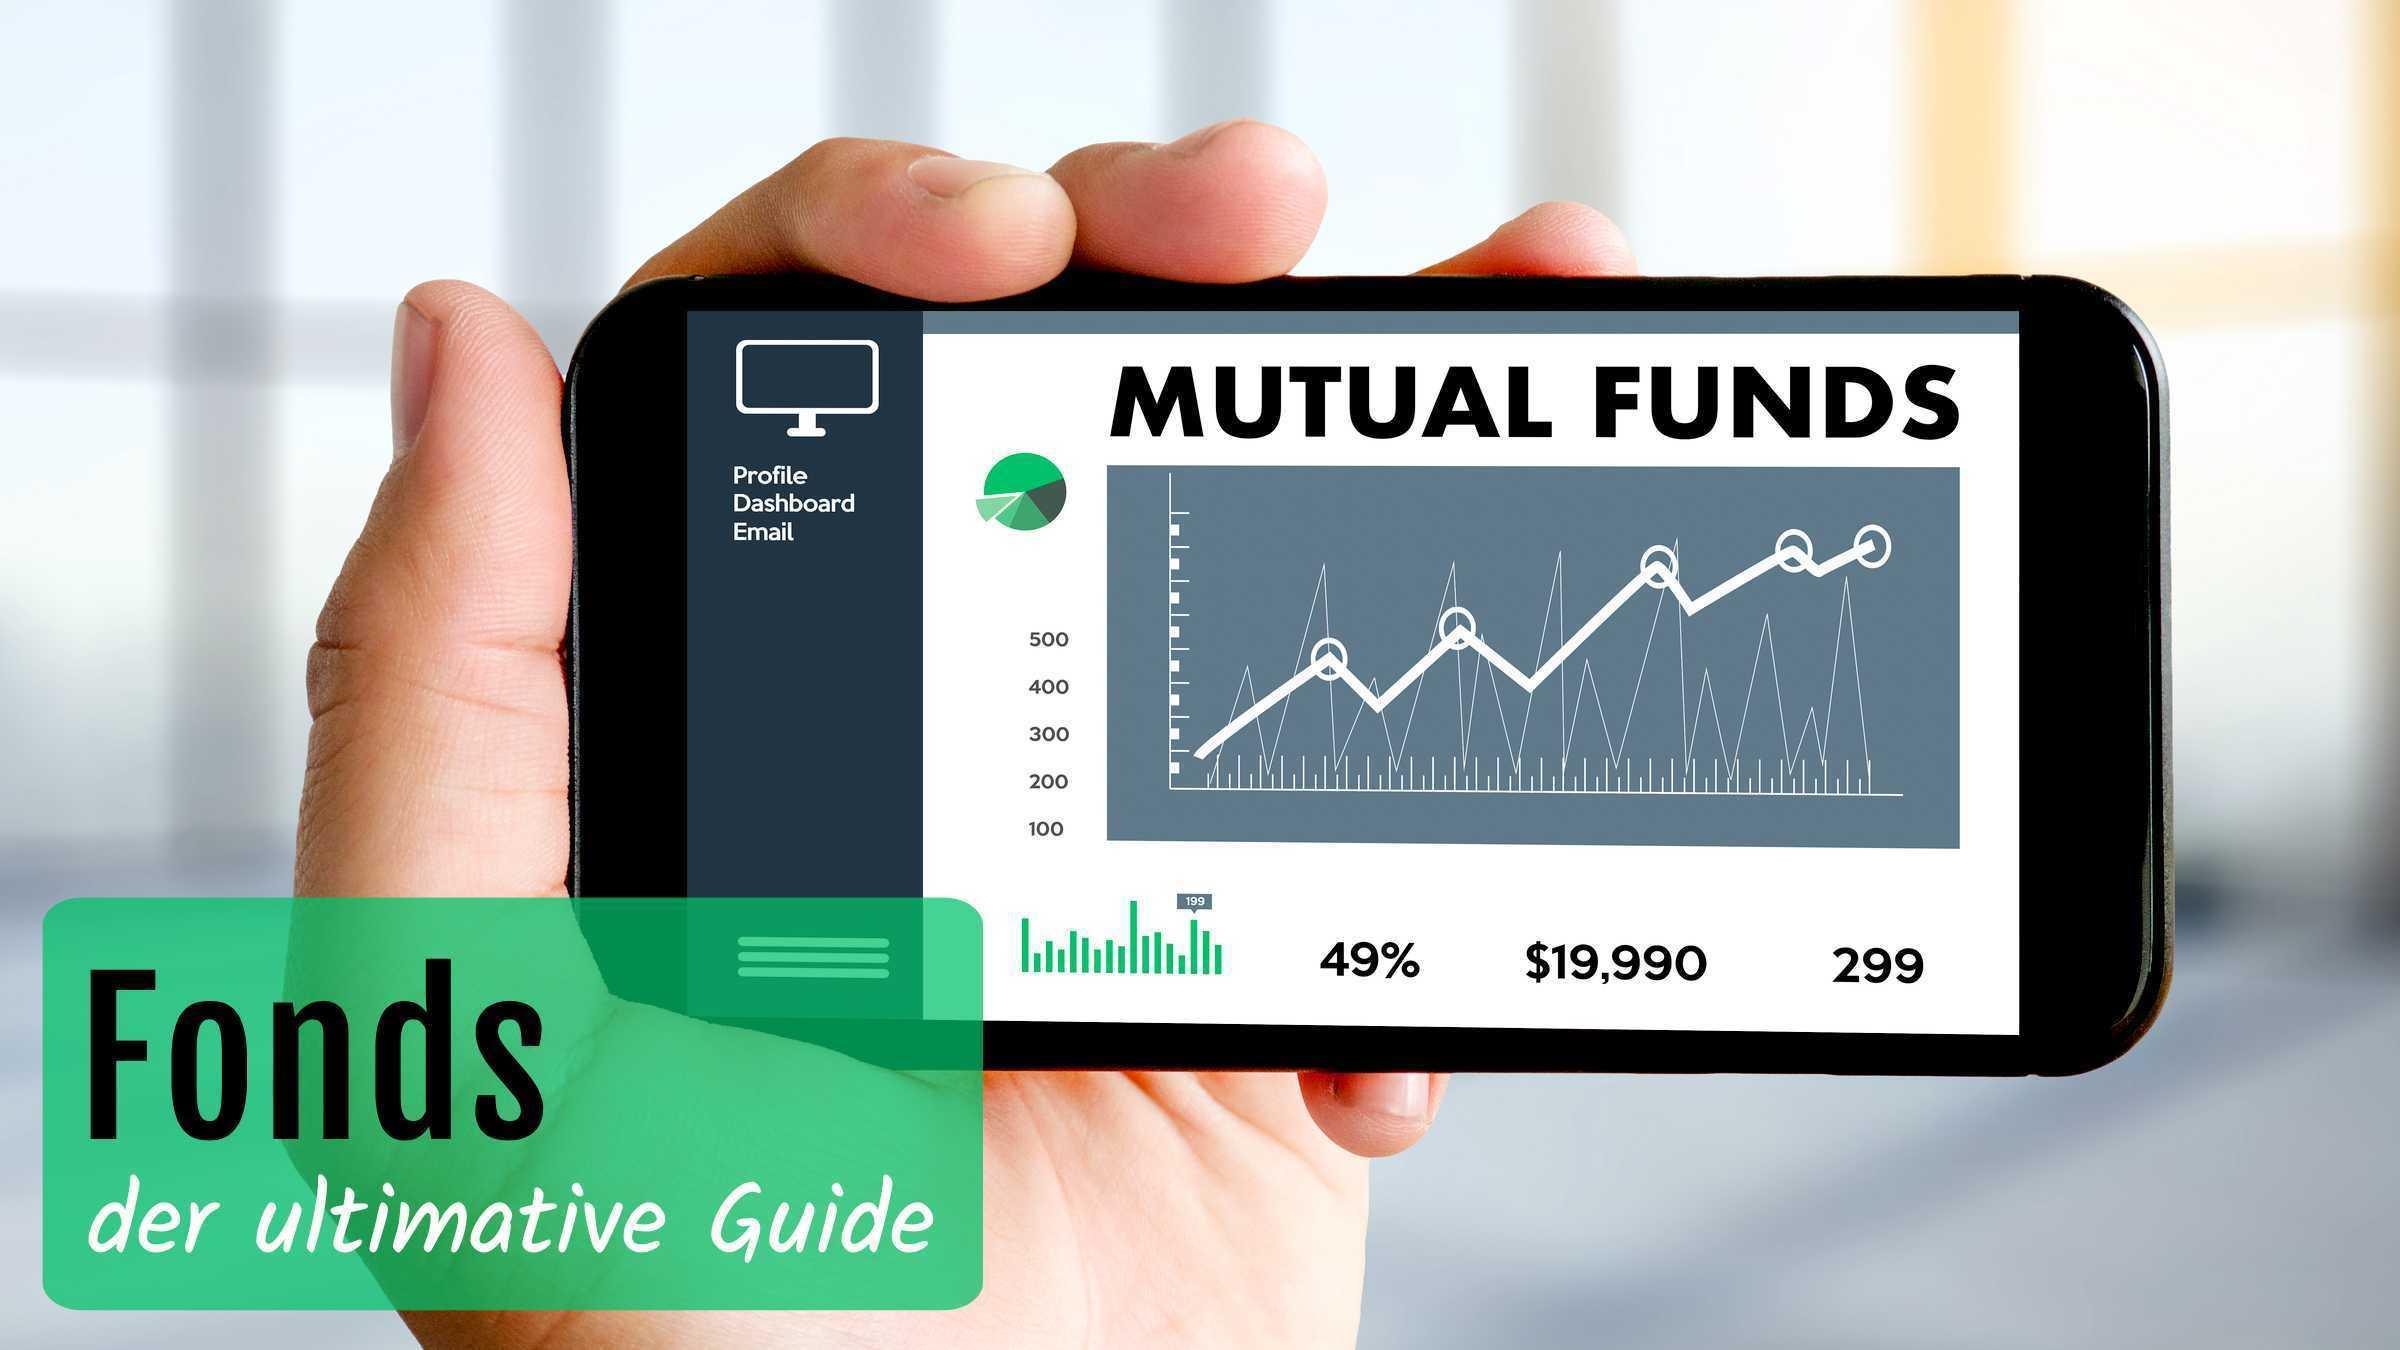 Enqome der ultimative Fonds Guide